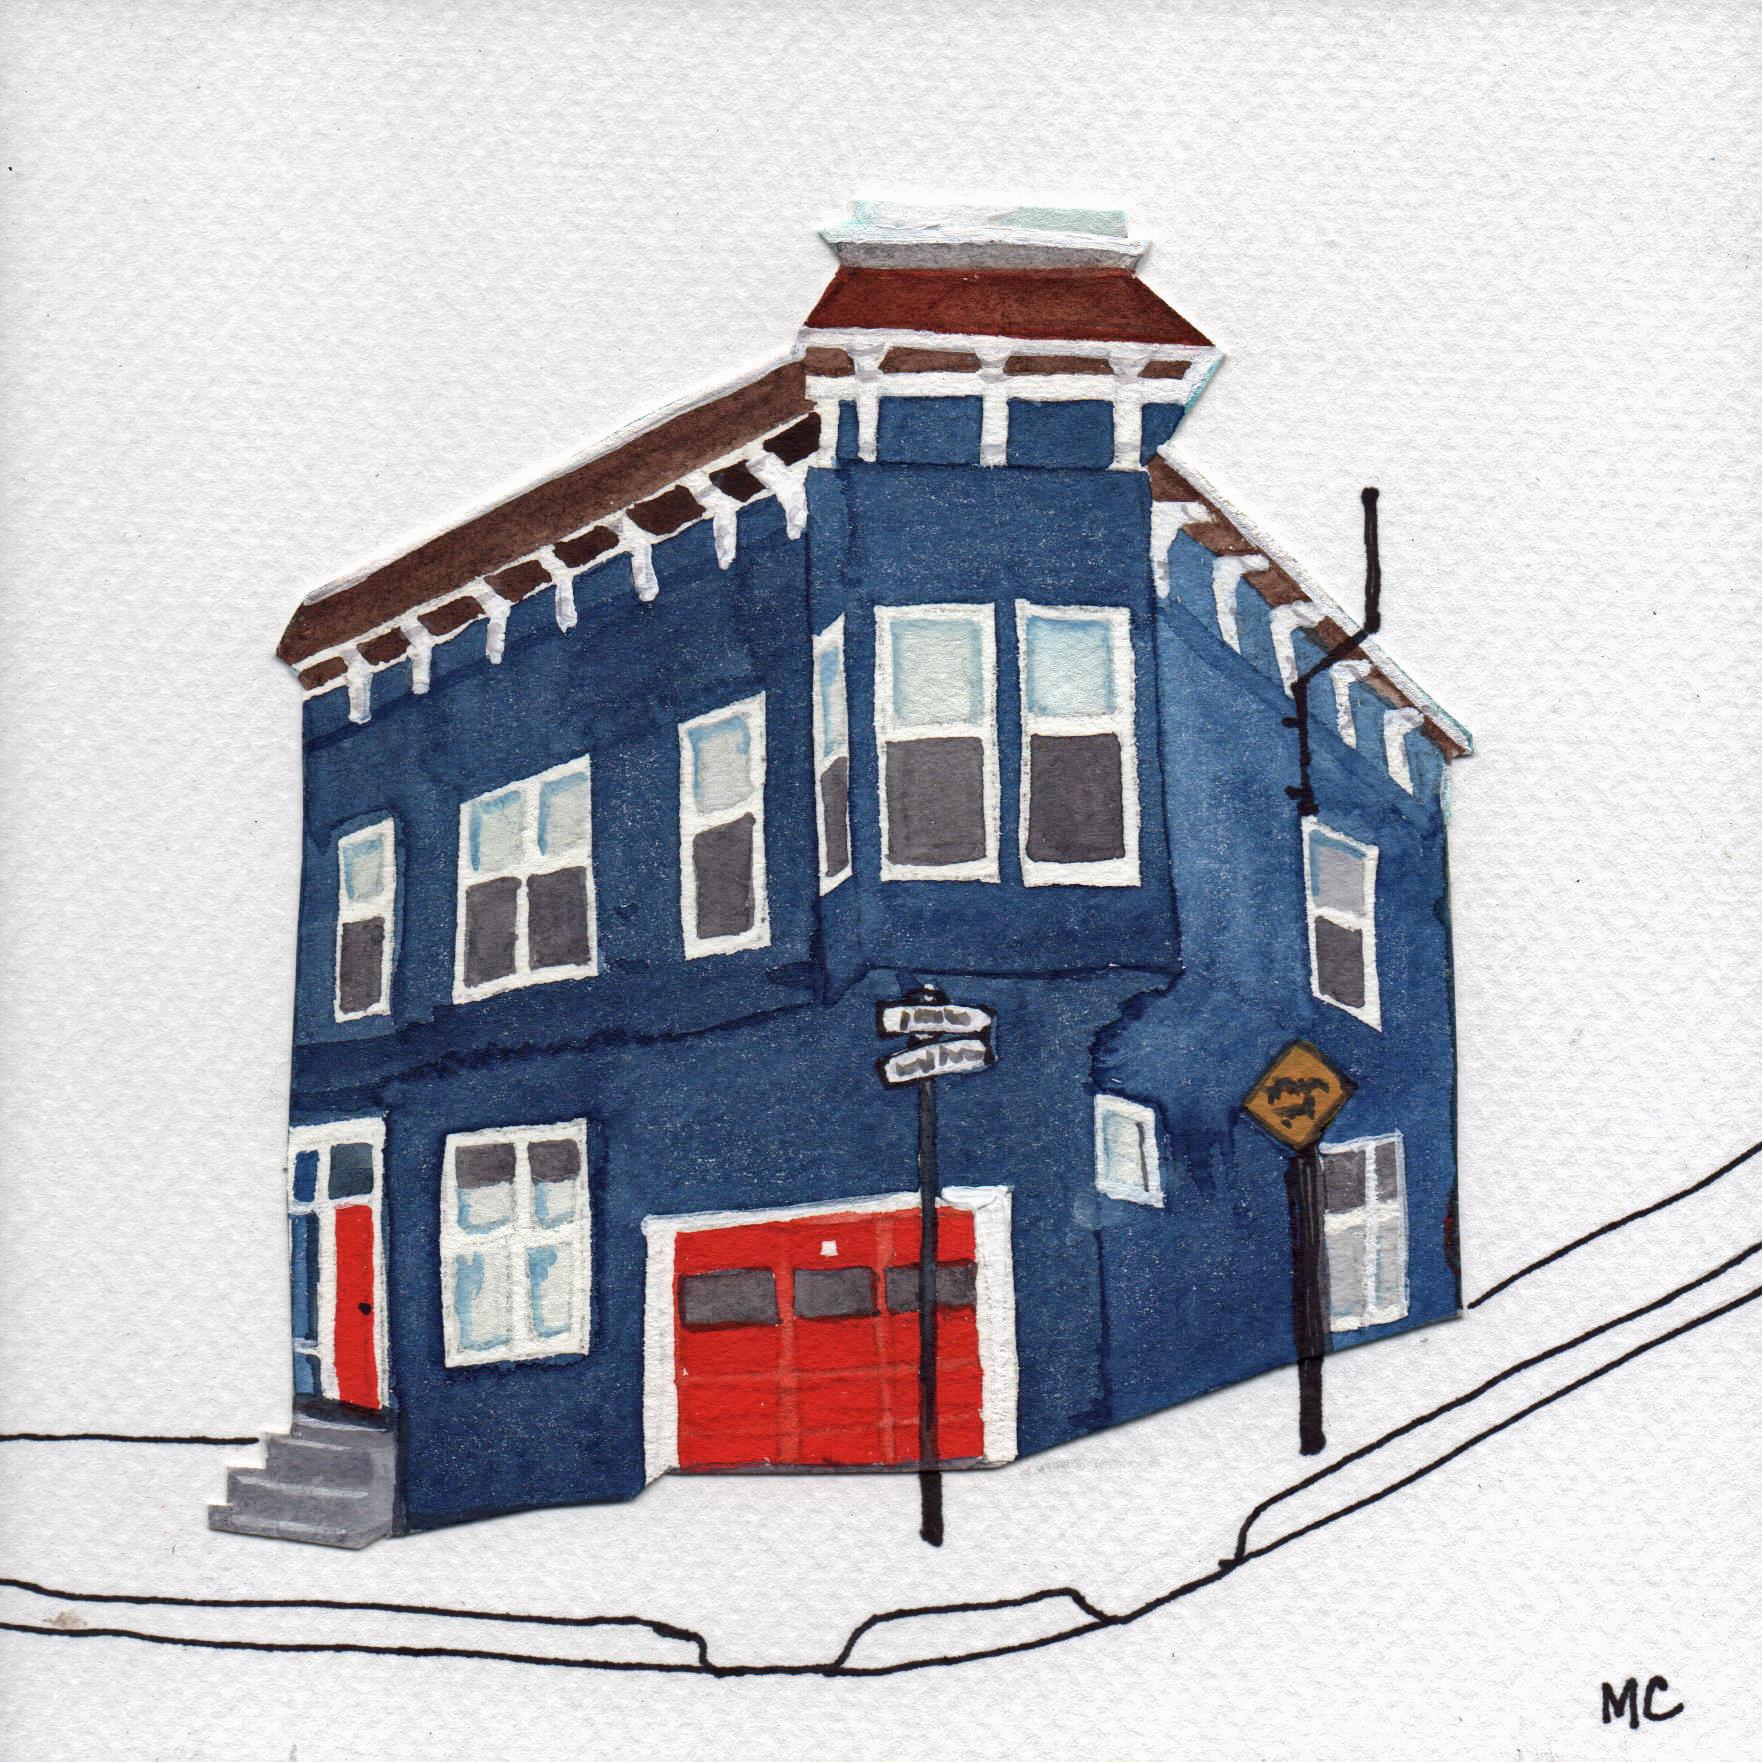 House on Bernal #7